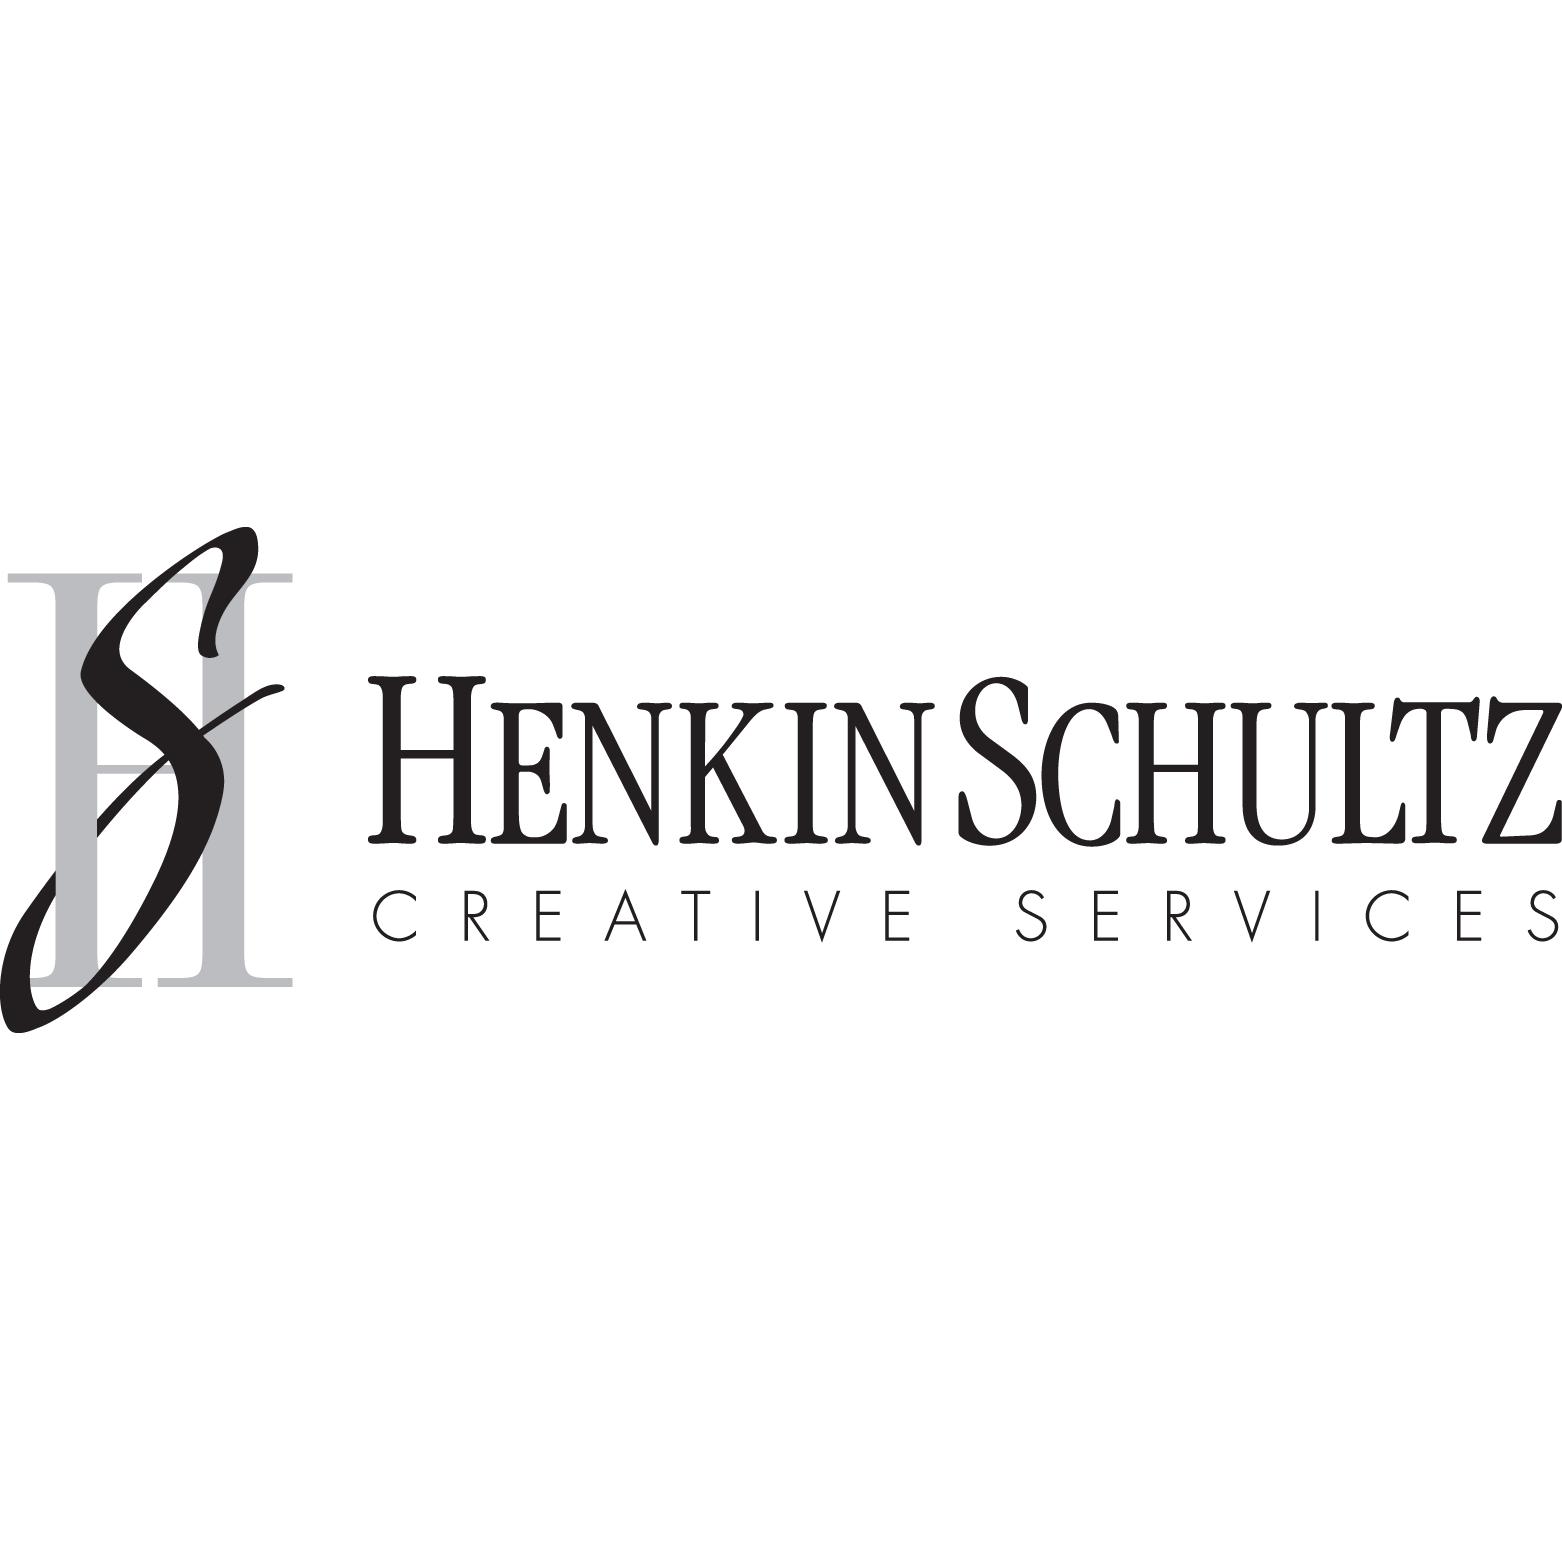 HenkinSchultz Creative Services - Sioux Falls, SD 57108 - (605)331-2155 | ShowMeLocal.com